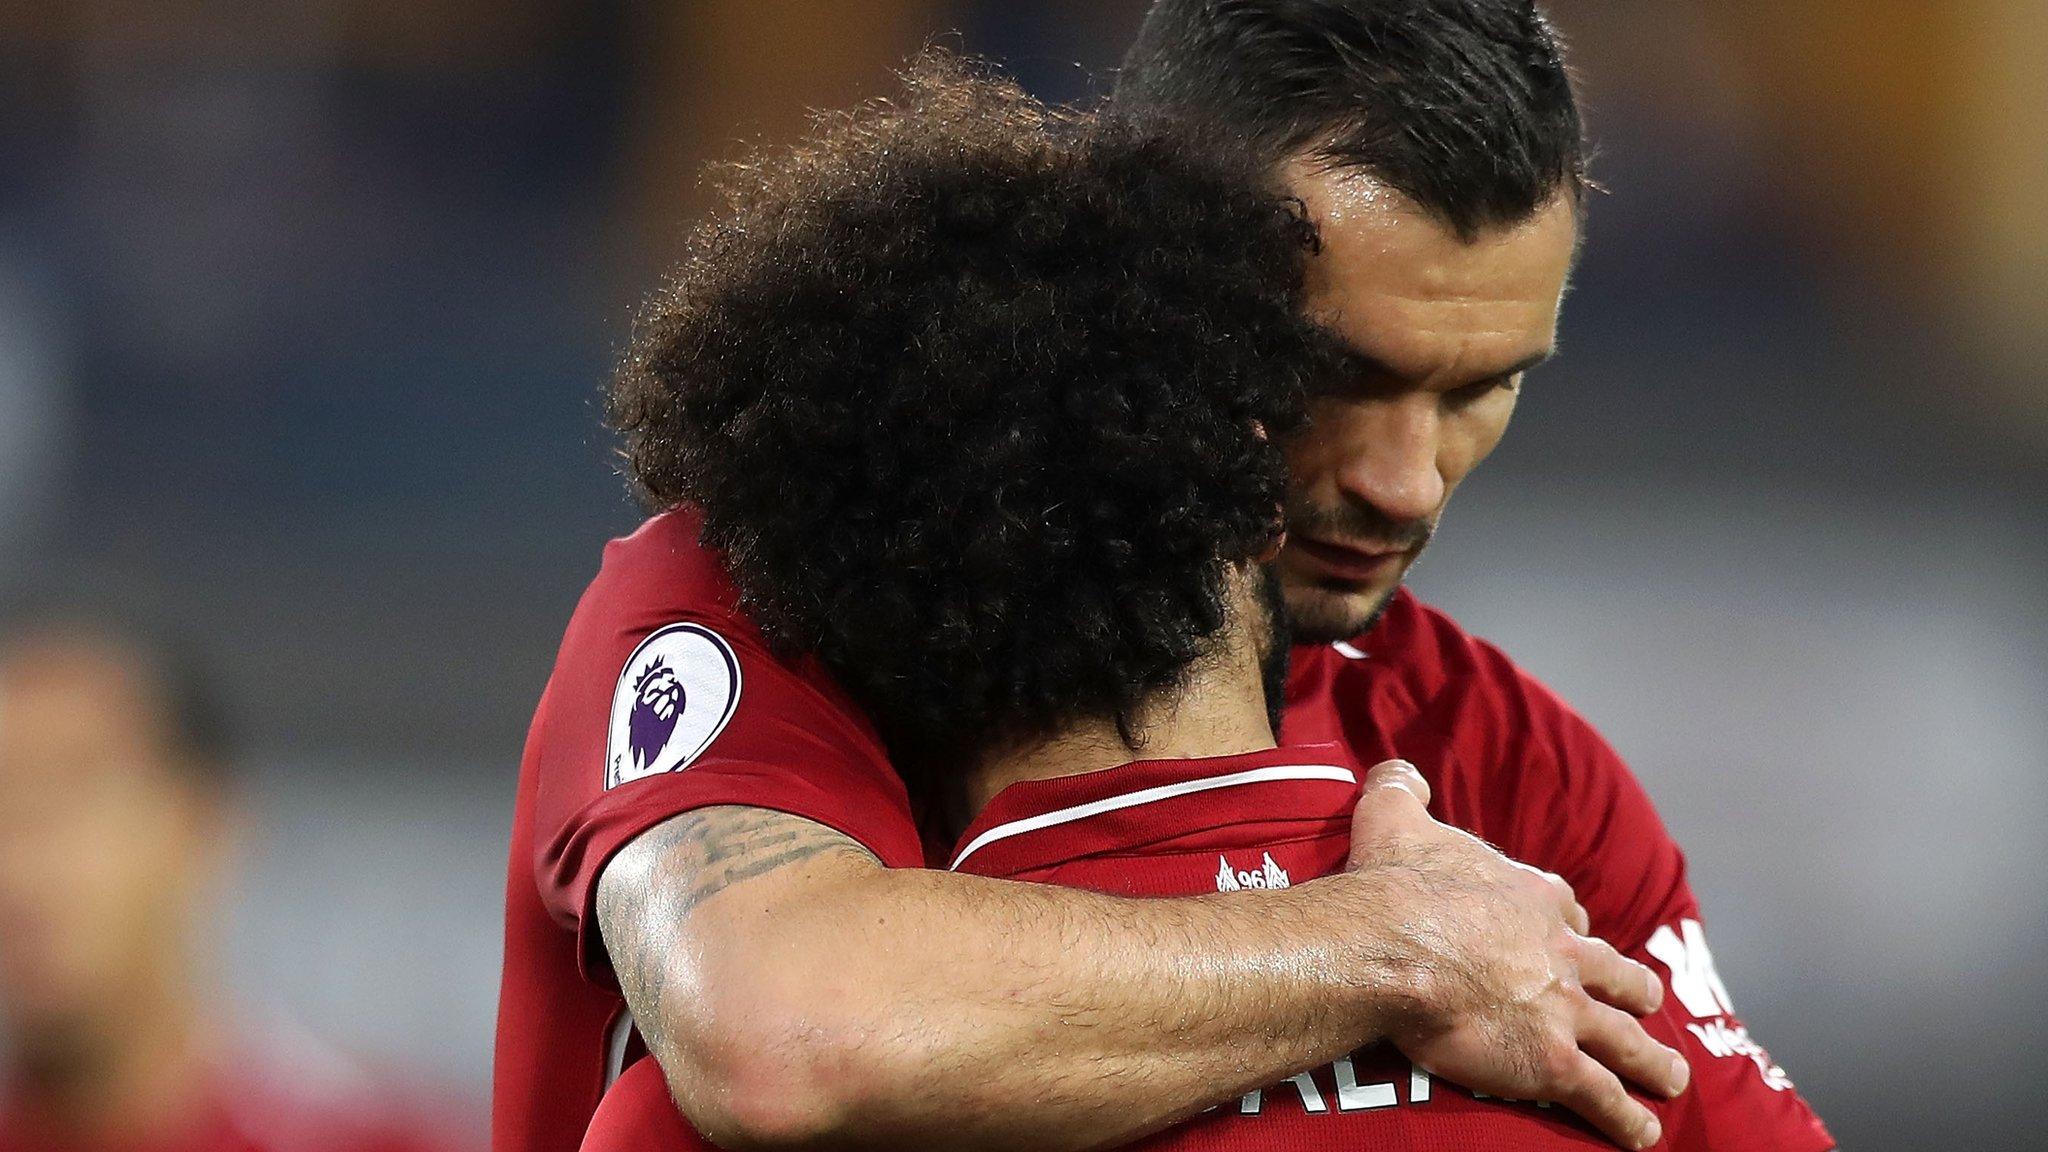 Huddersfield Town 0-1 Liverpool: Mohamed Salah's strike earns narrow win